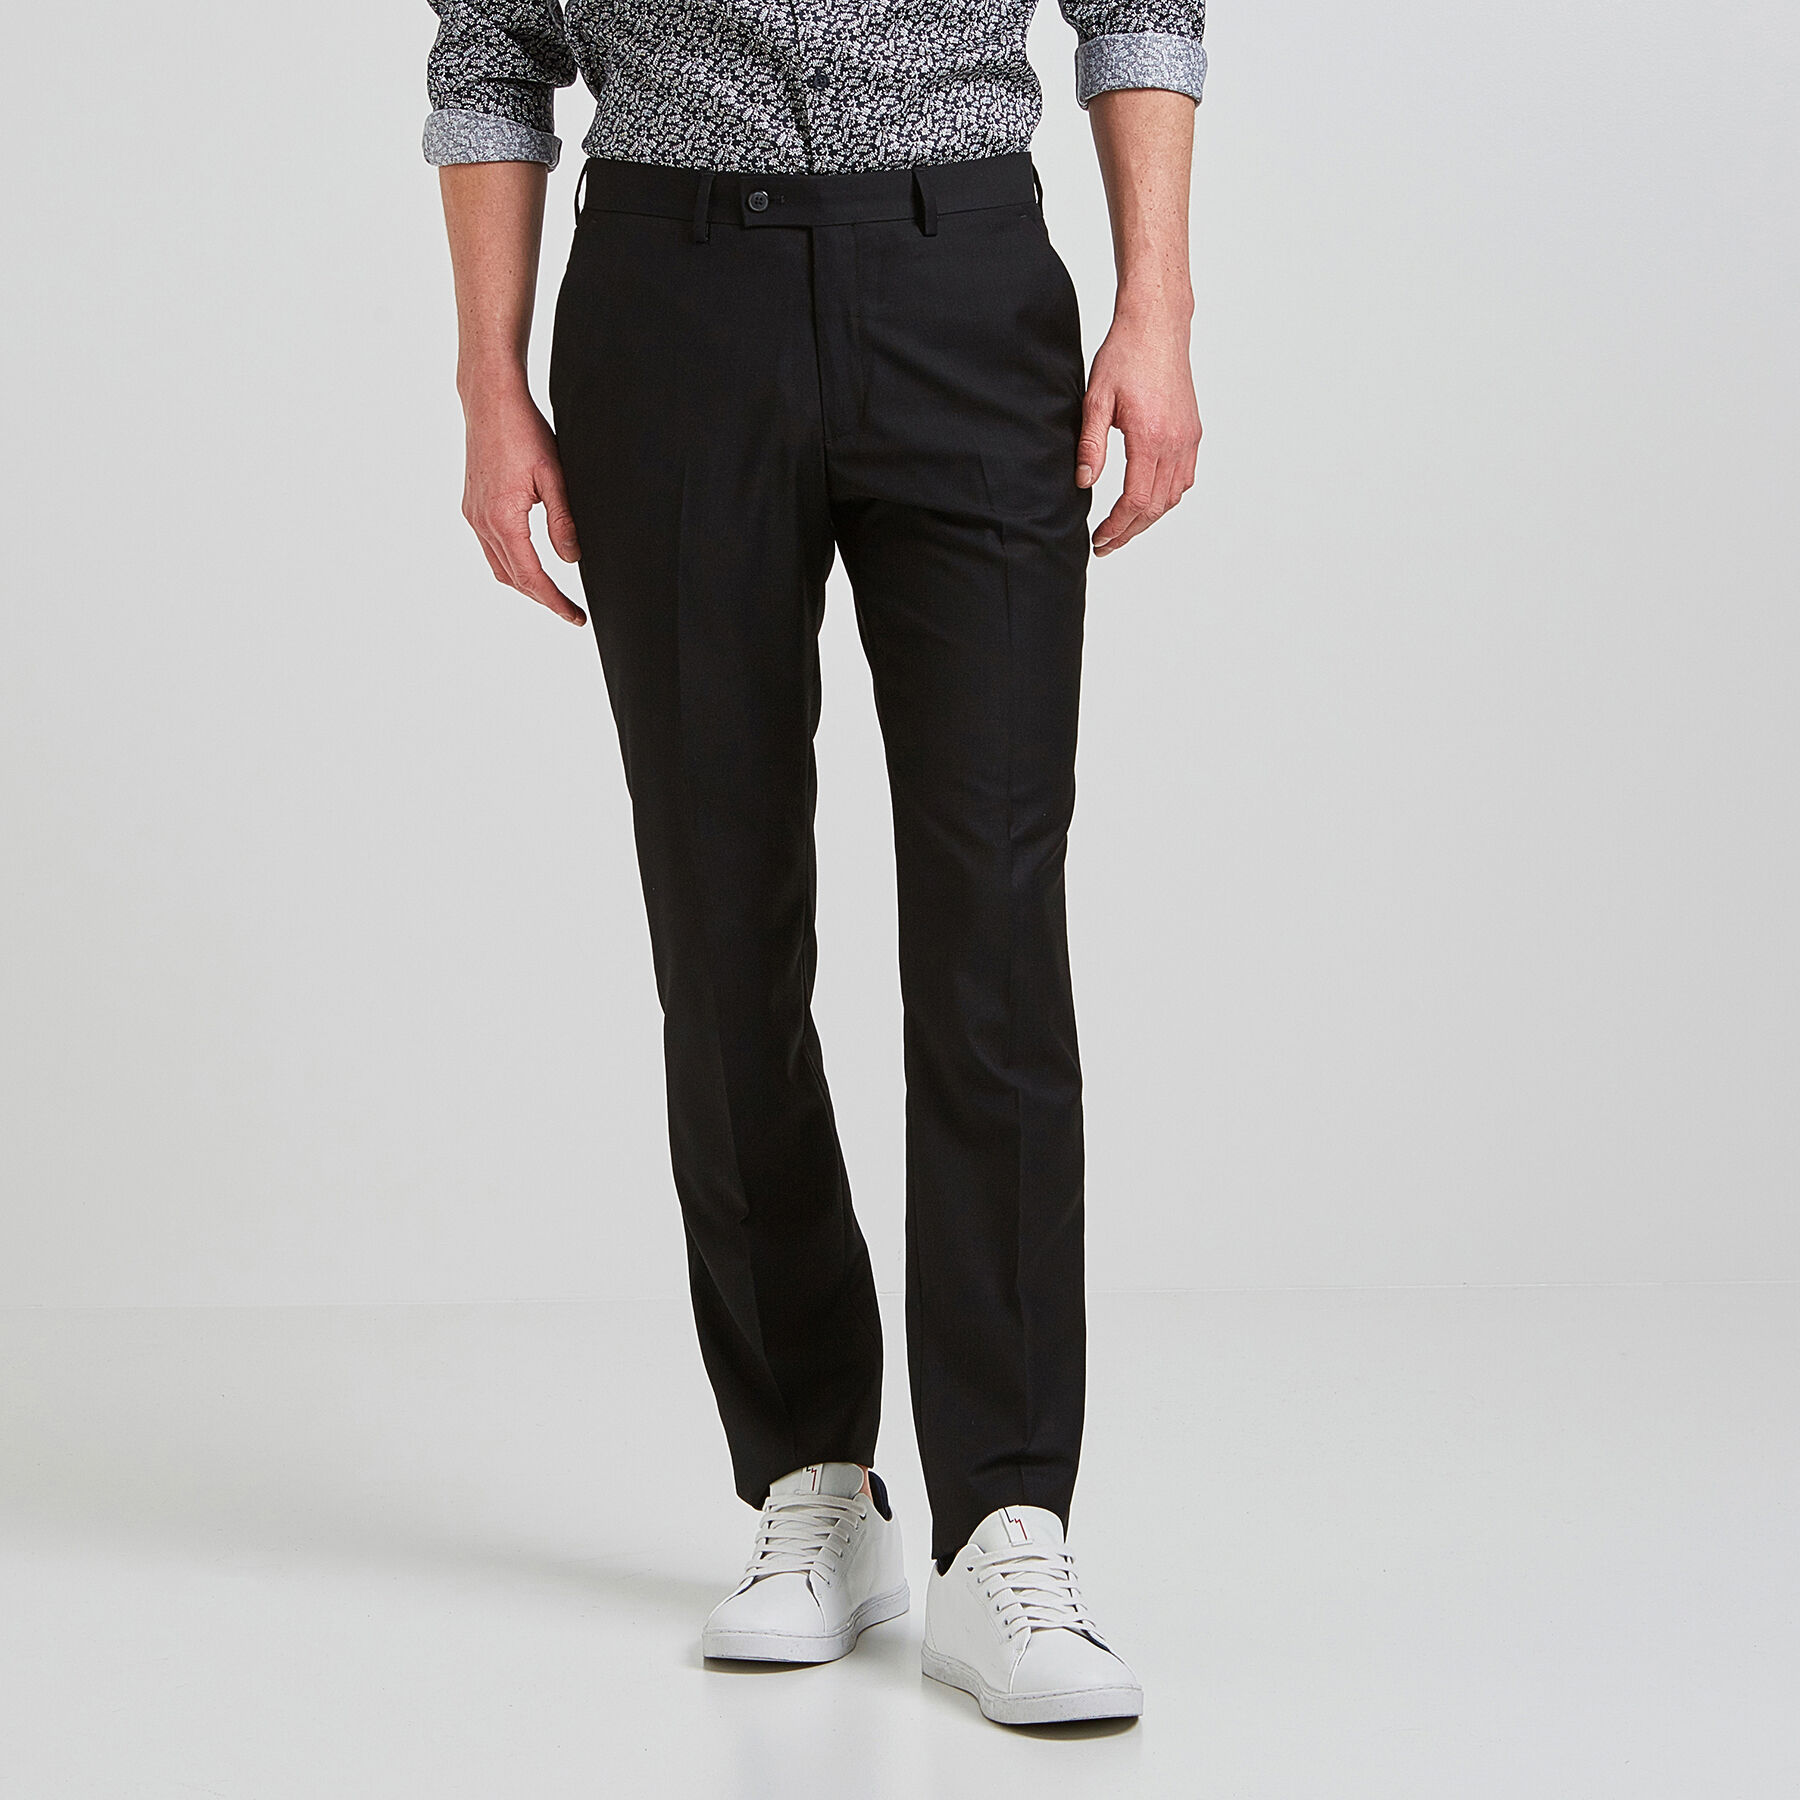 Veste Homme Jules Blazer Costume Pantalon vSFq5axww